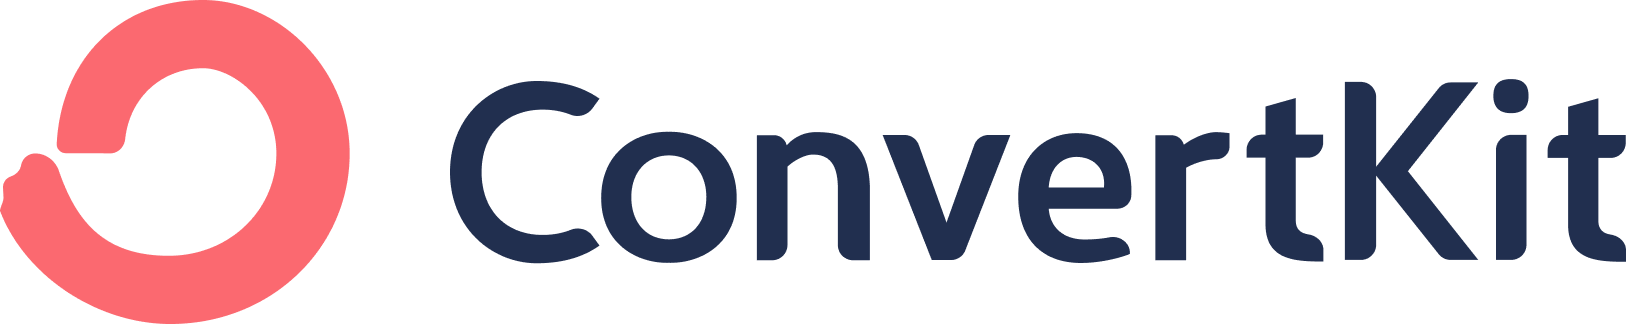 convertkit-long.png